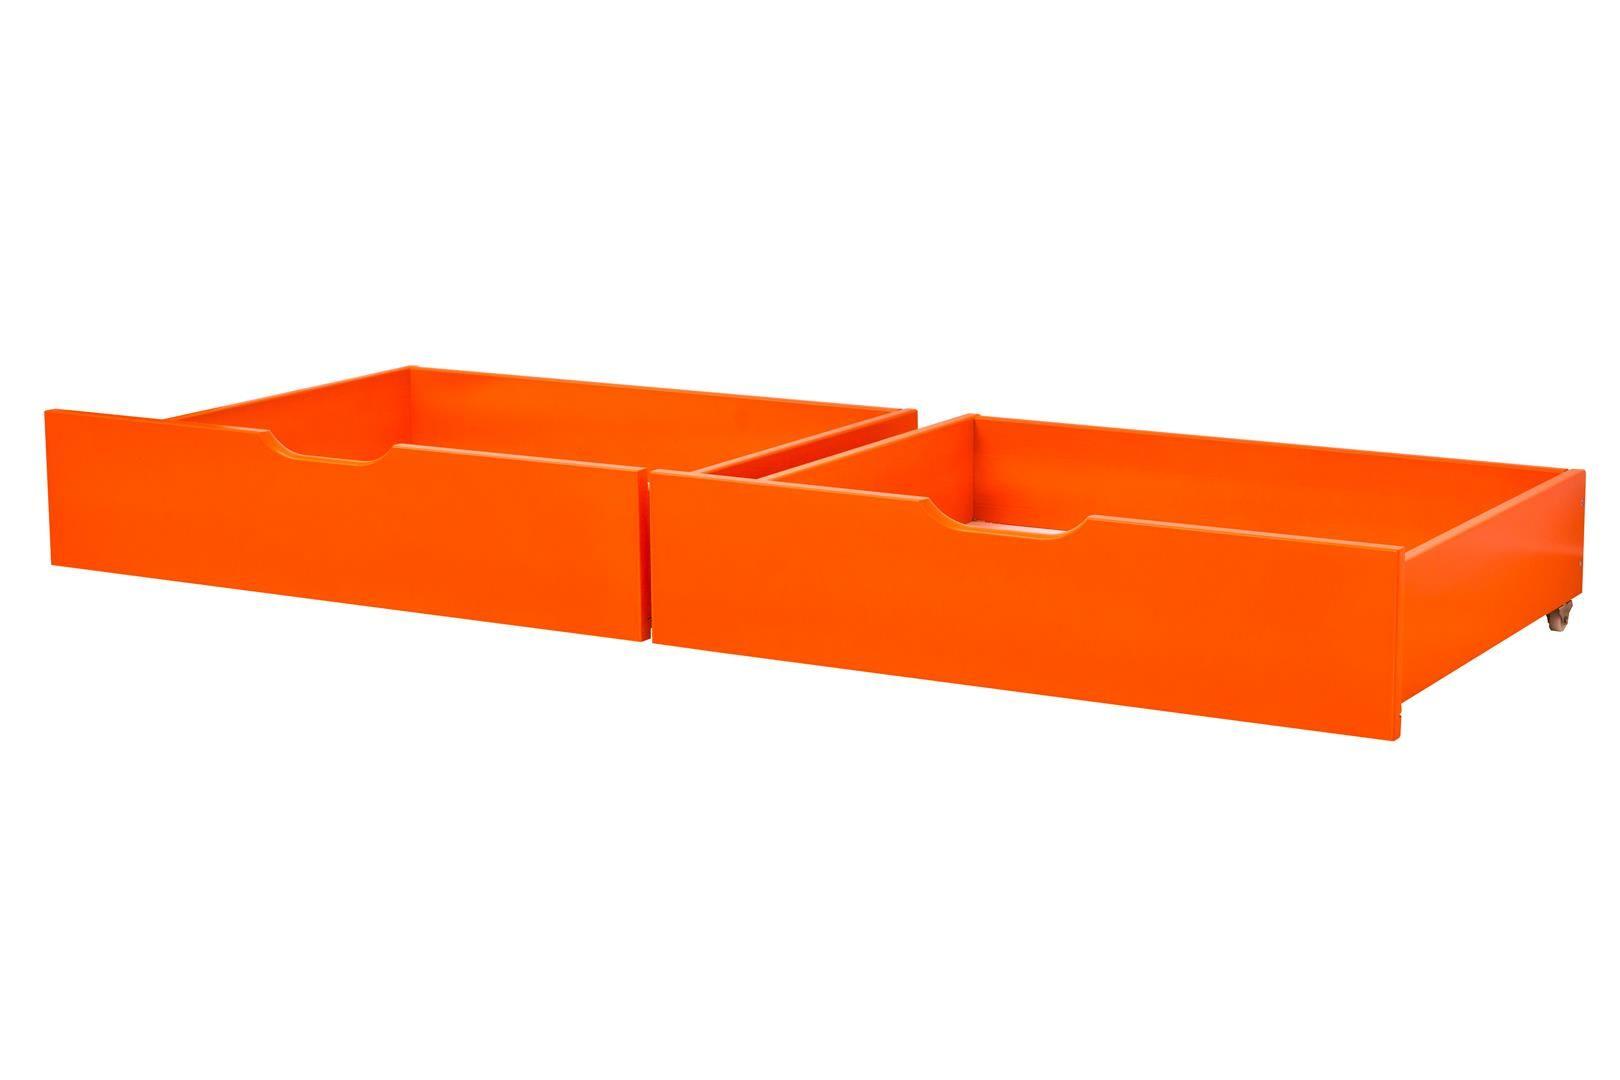 Sengeskuffesæt fra Hoppekids - Orange (182x60)